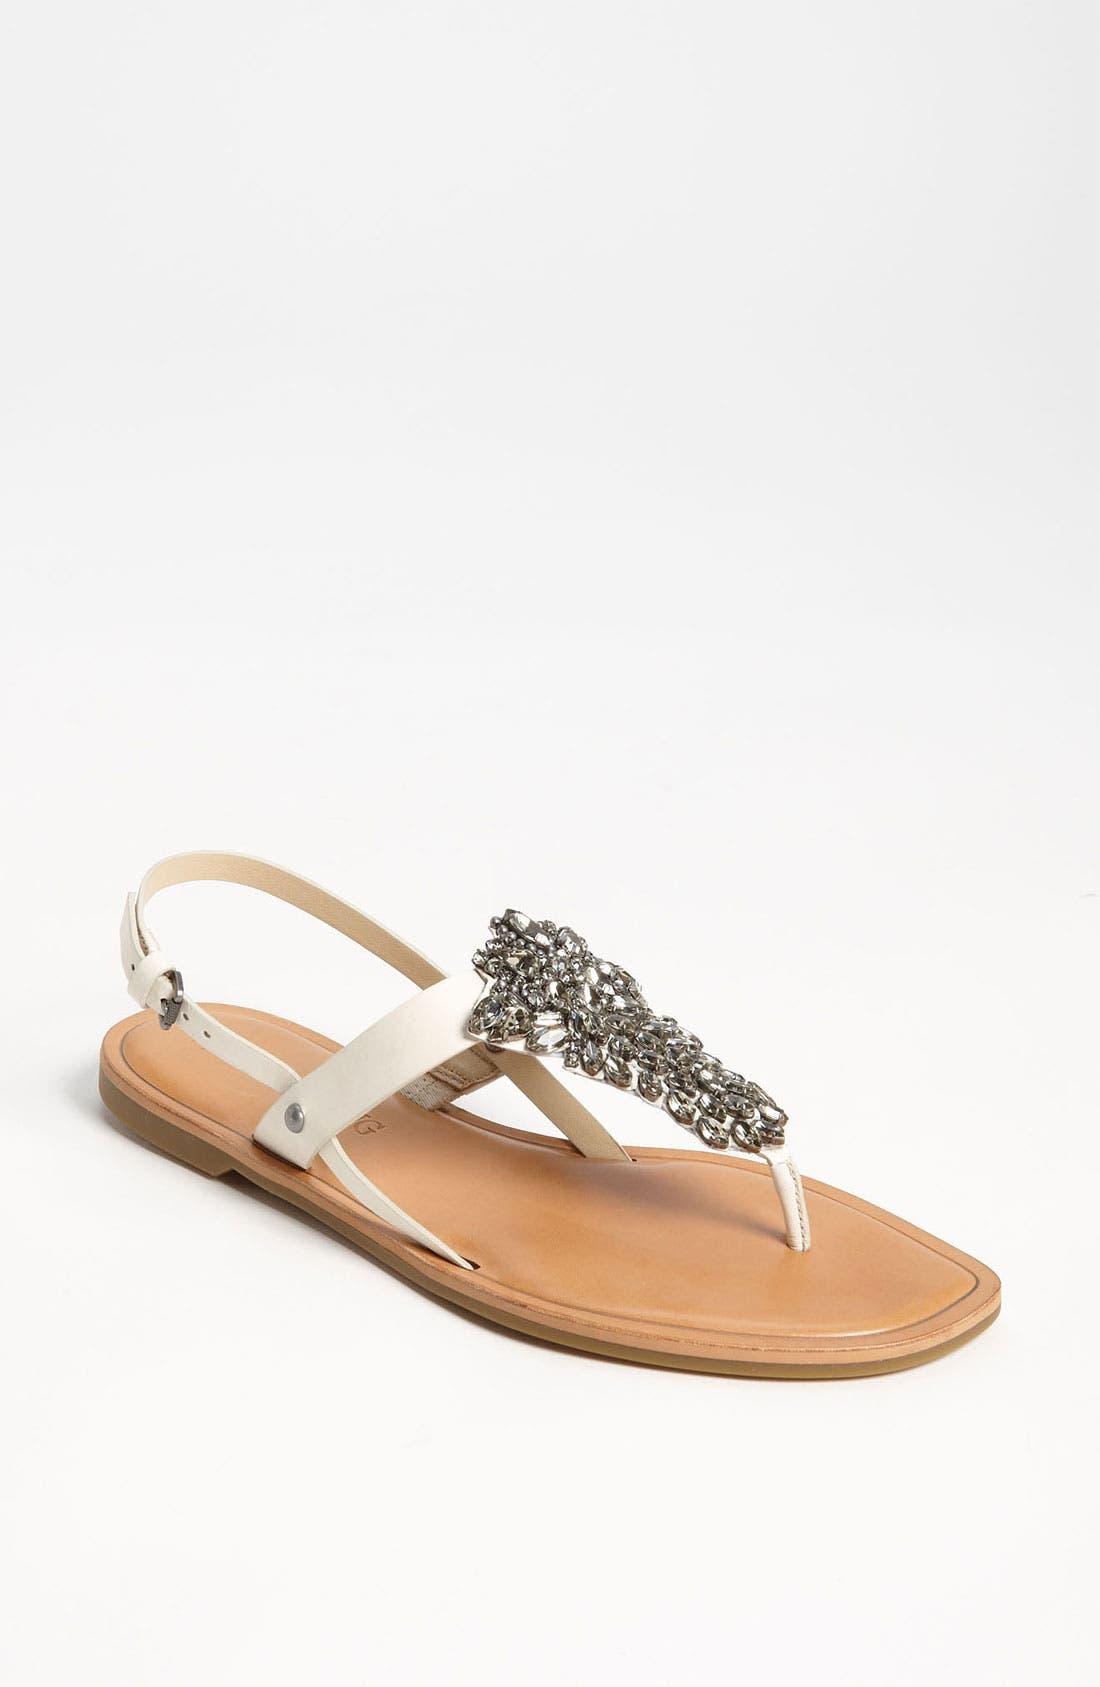 Main Image - Vera Wang Footwear 'Avy' Sandal (Online Only)